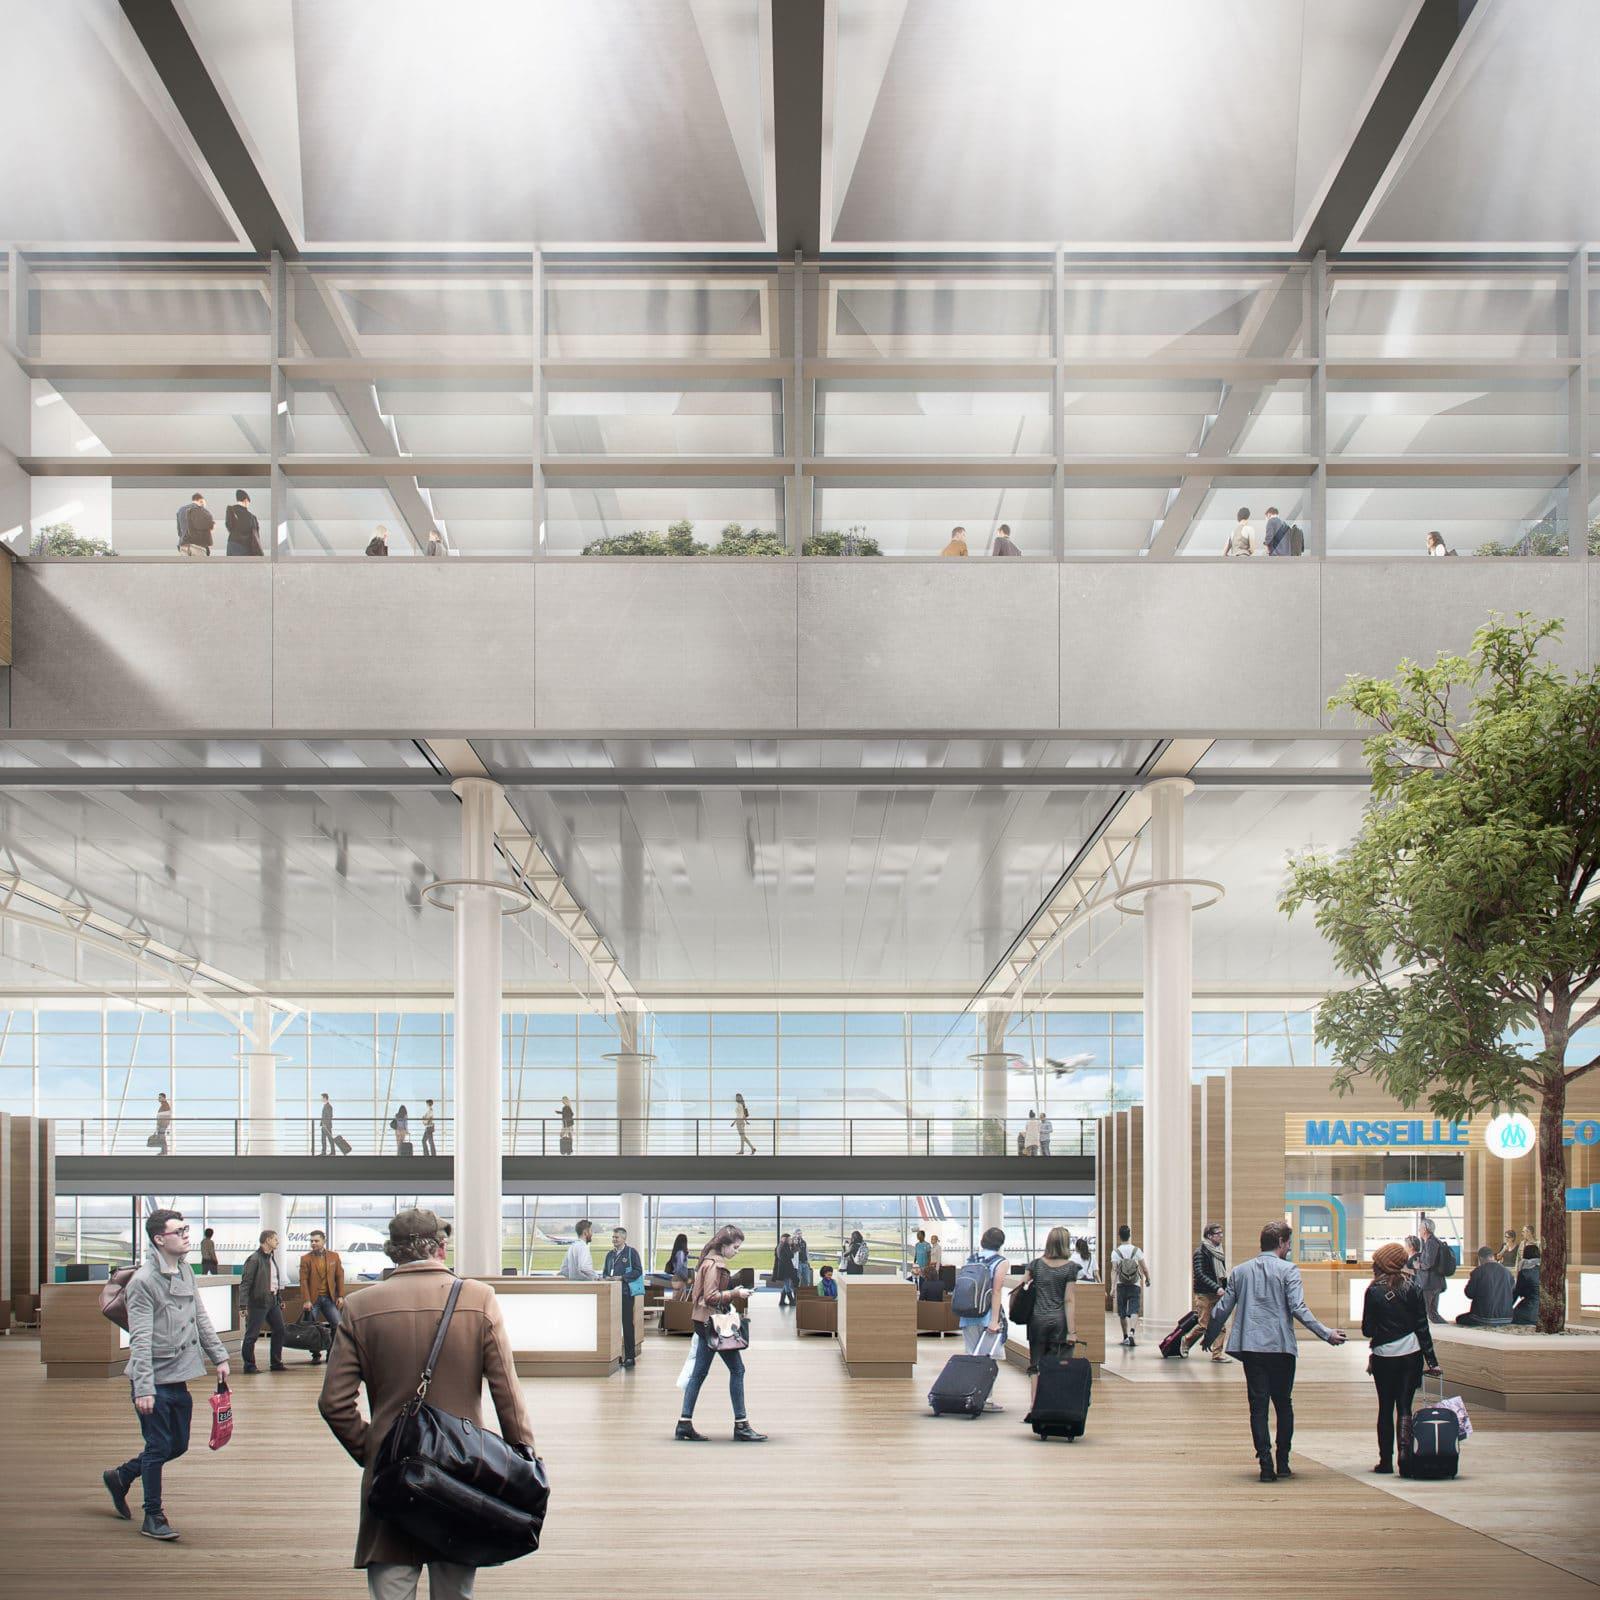 aeroport marseille extension foster 2